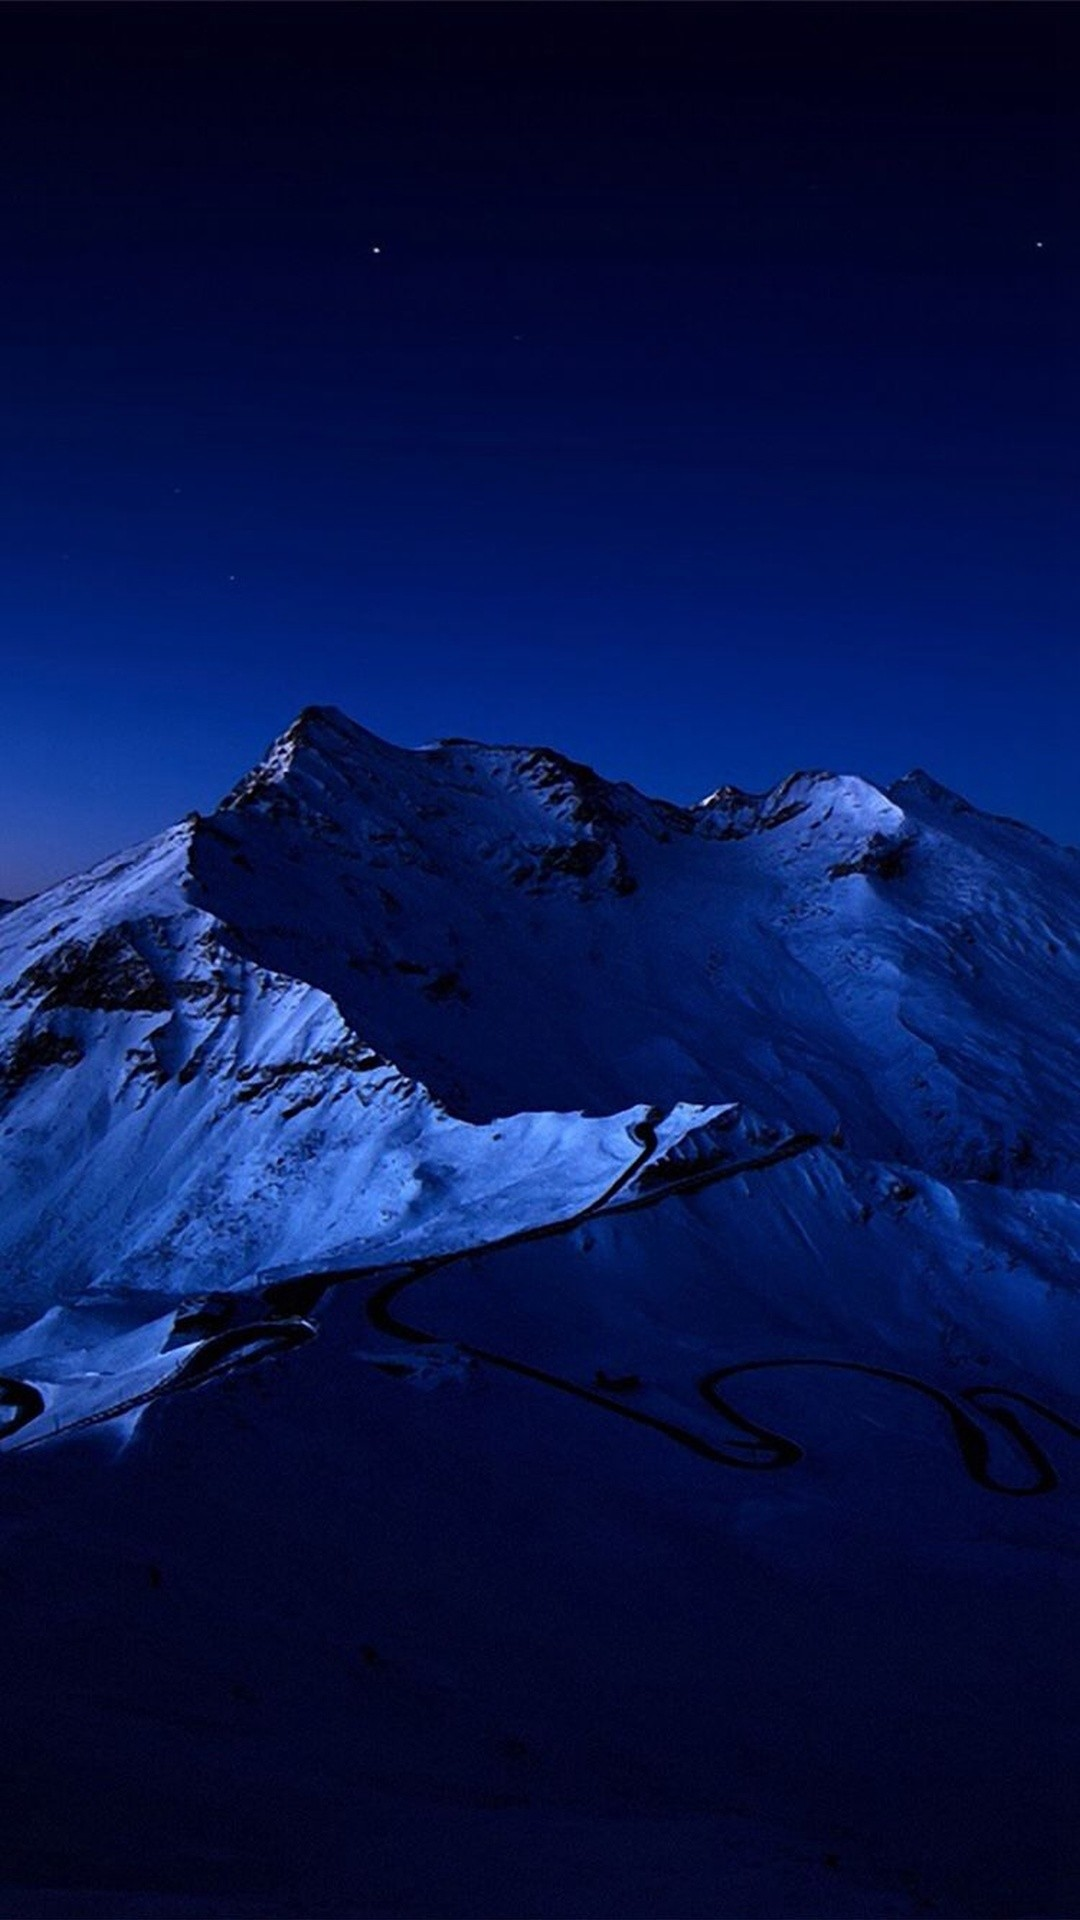 blue.quenalbertini: Night Sky Over Snow Mountain Peak iPhone 6 Plus  Wallpaper